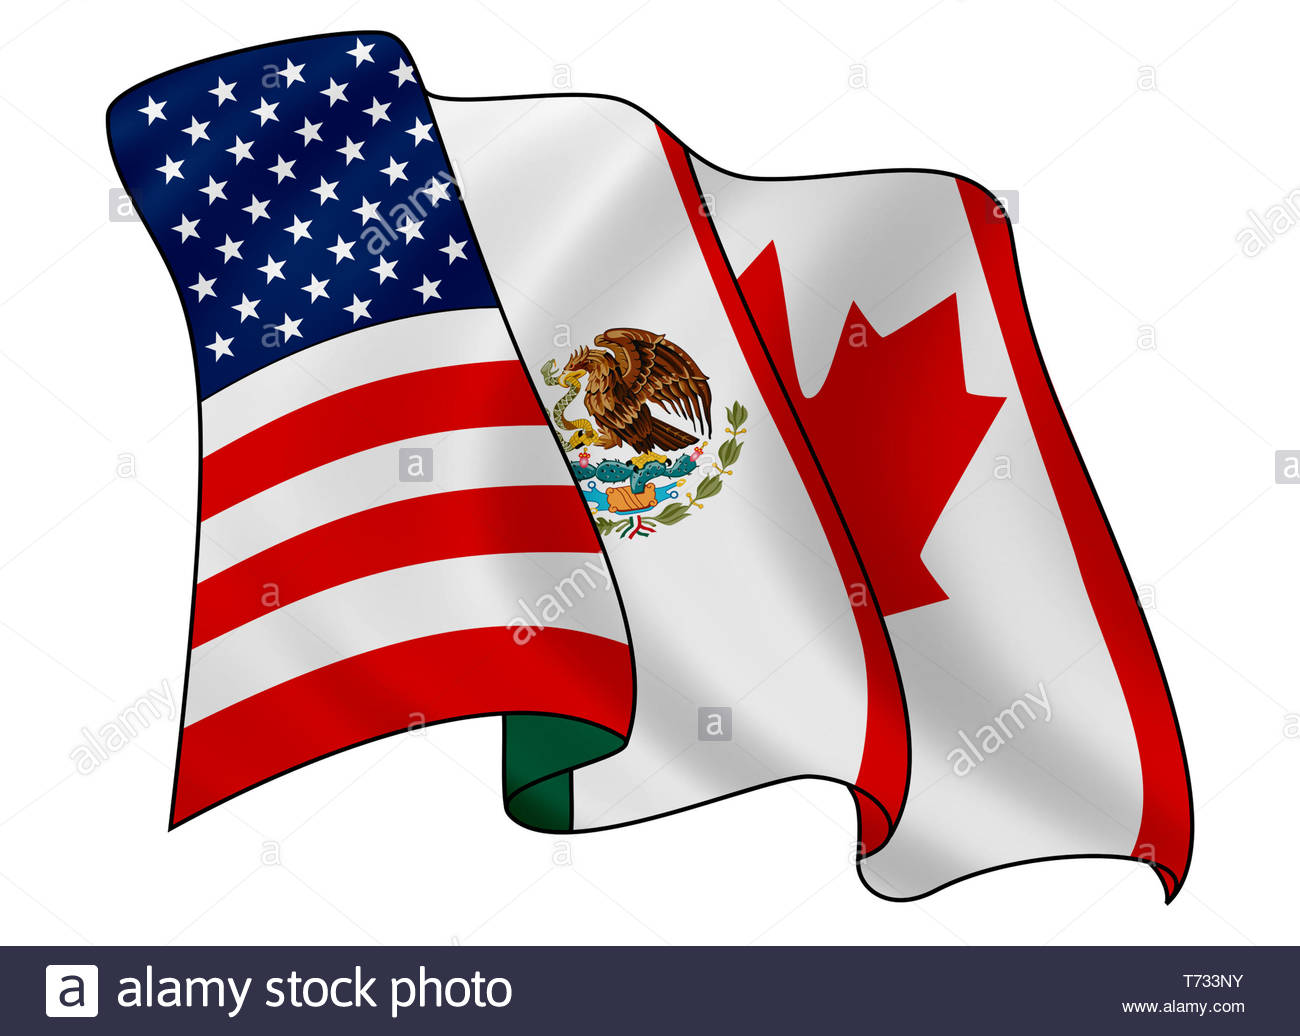 North American Free Trade Agreement NAFTA logo Stock Photo